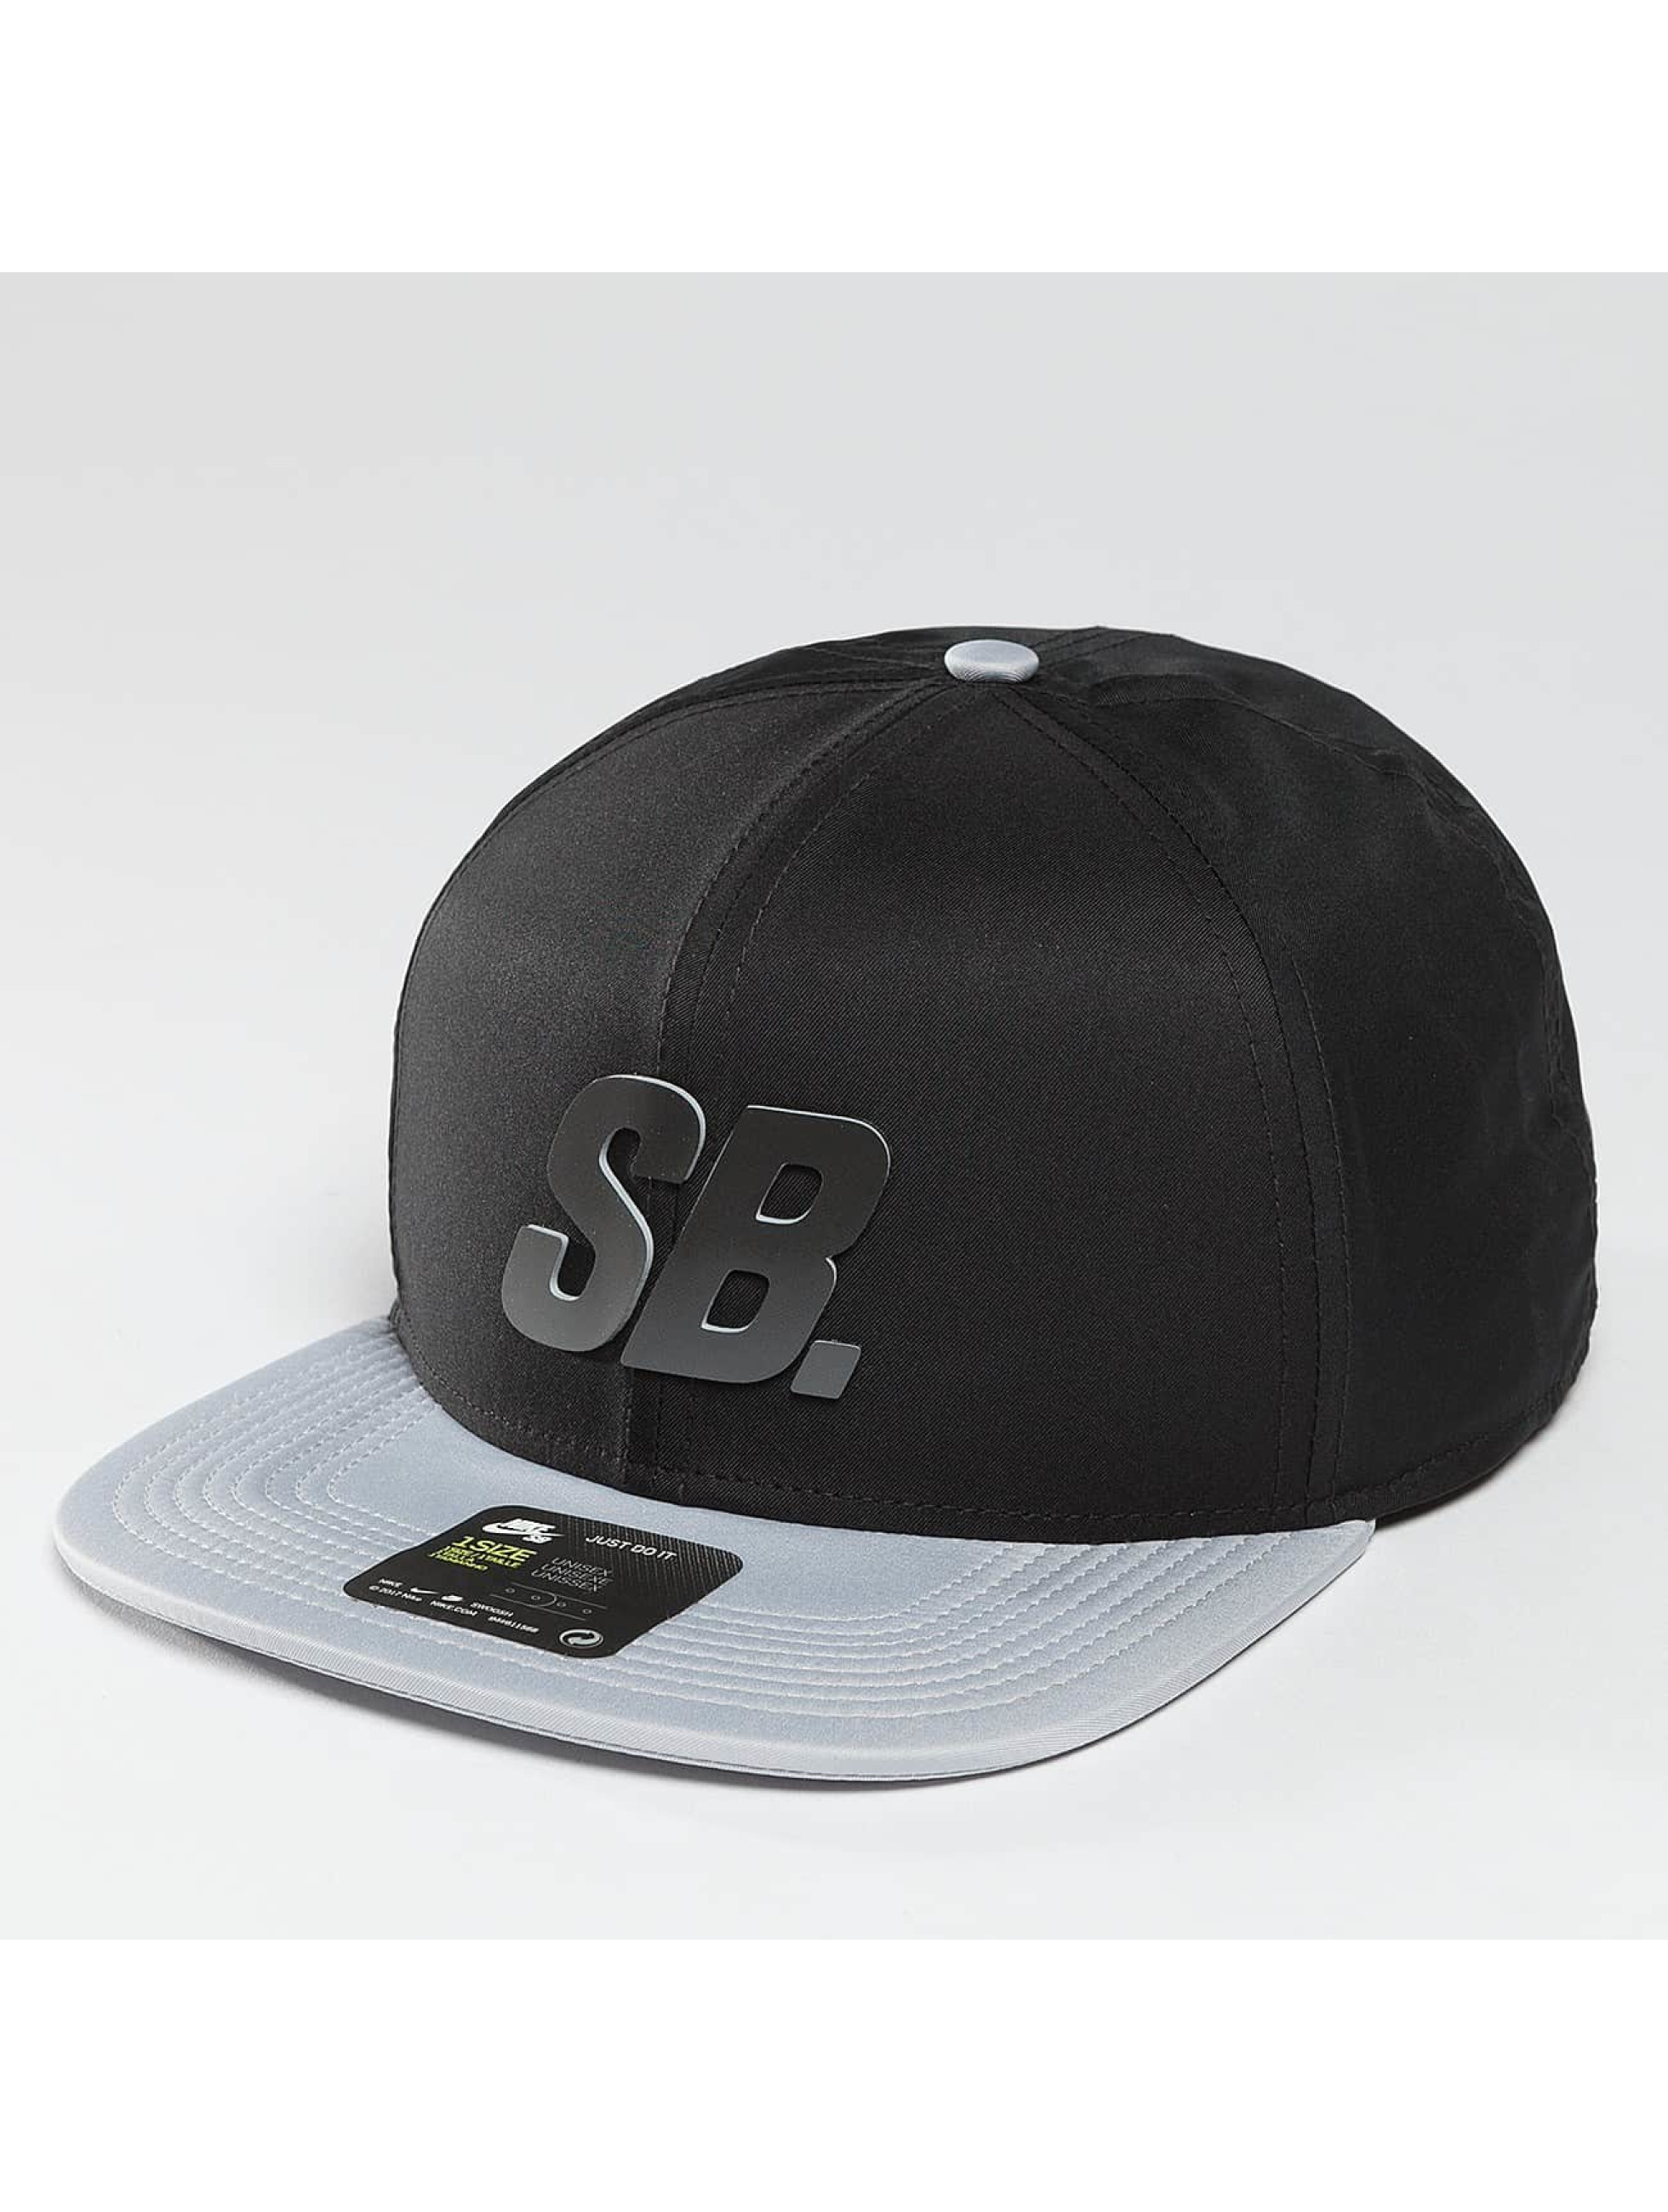 Nike SB Männer,Frauen Snapback Cap Dry in schwarz